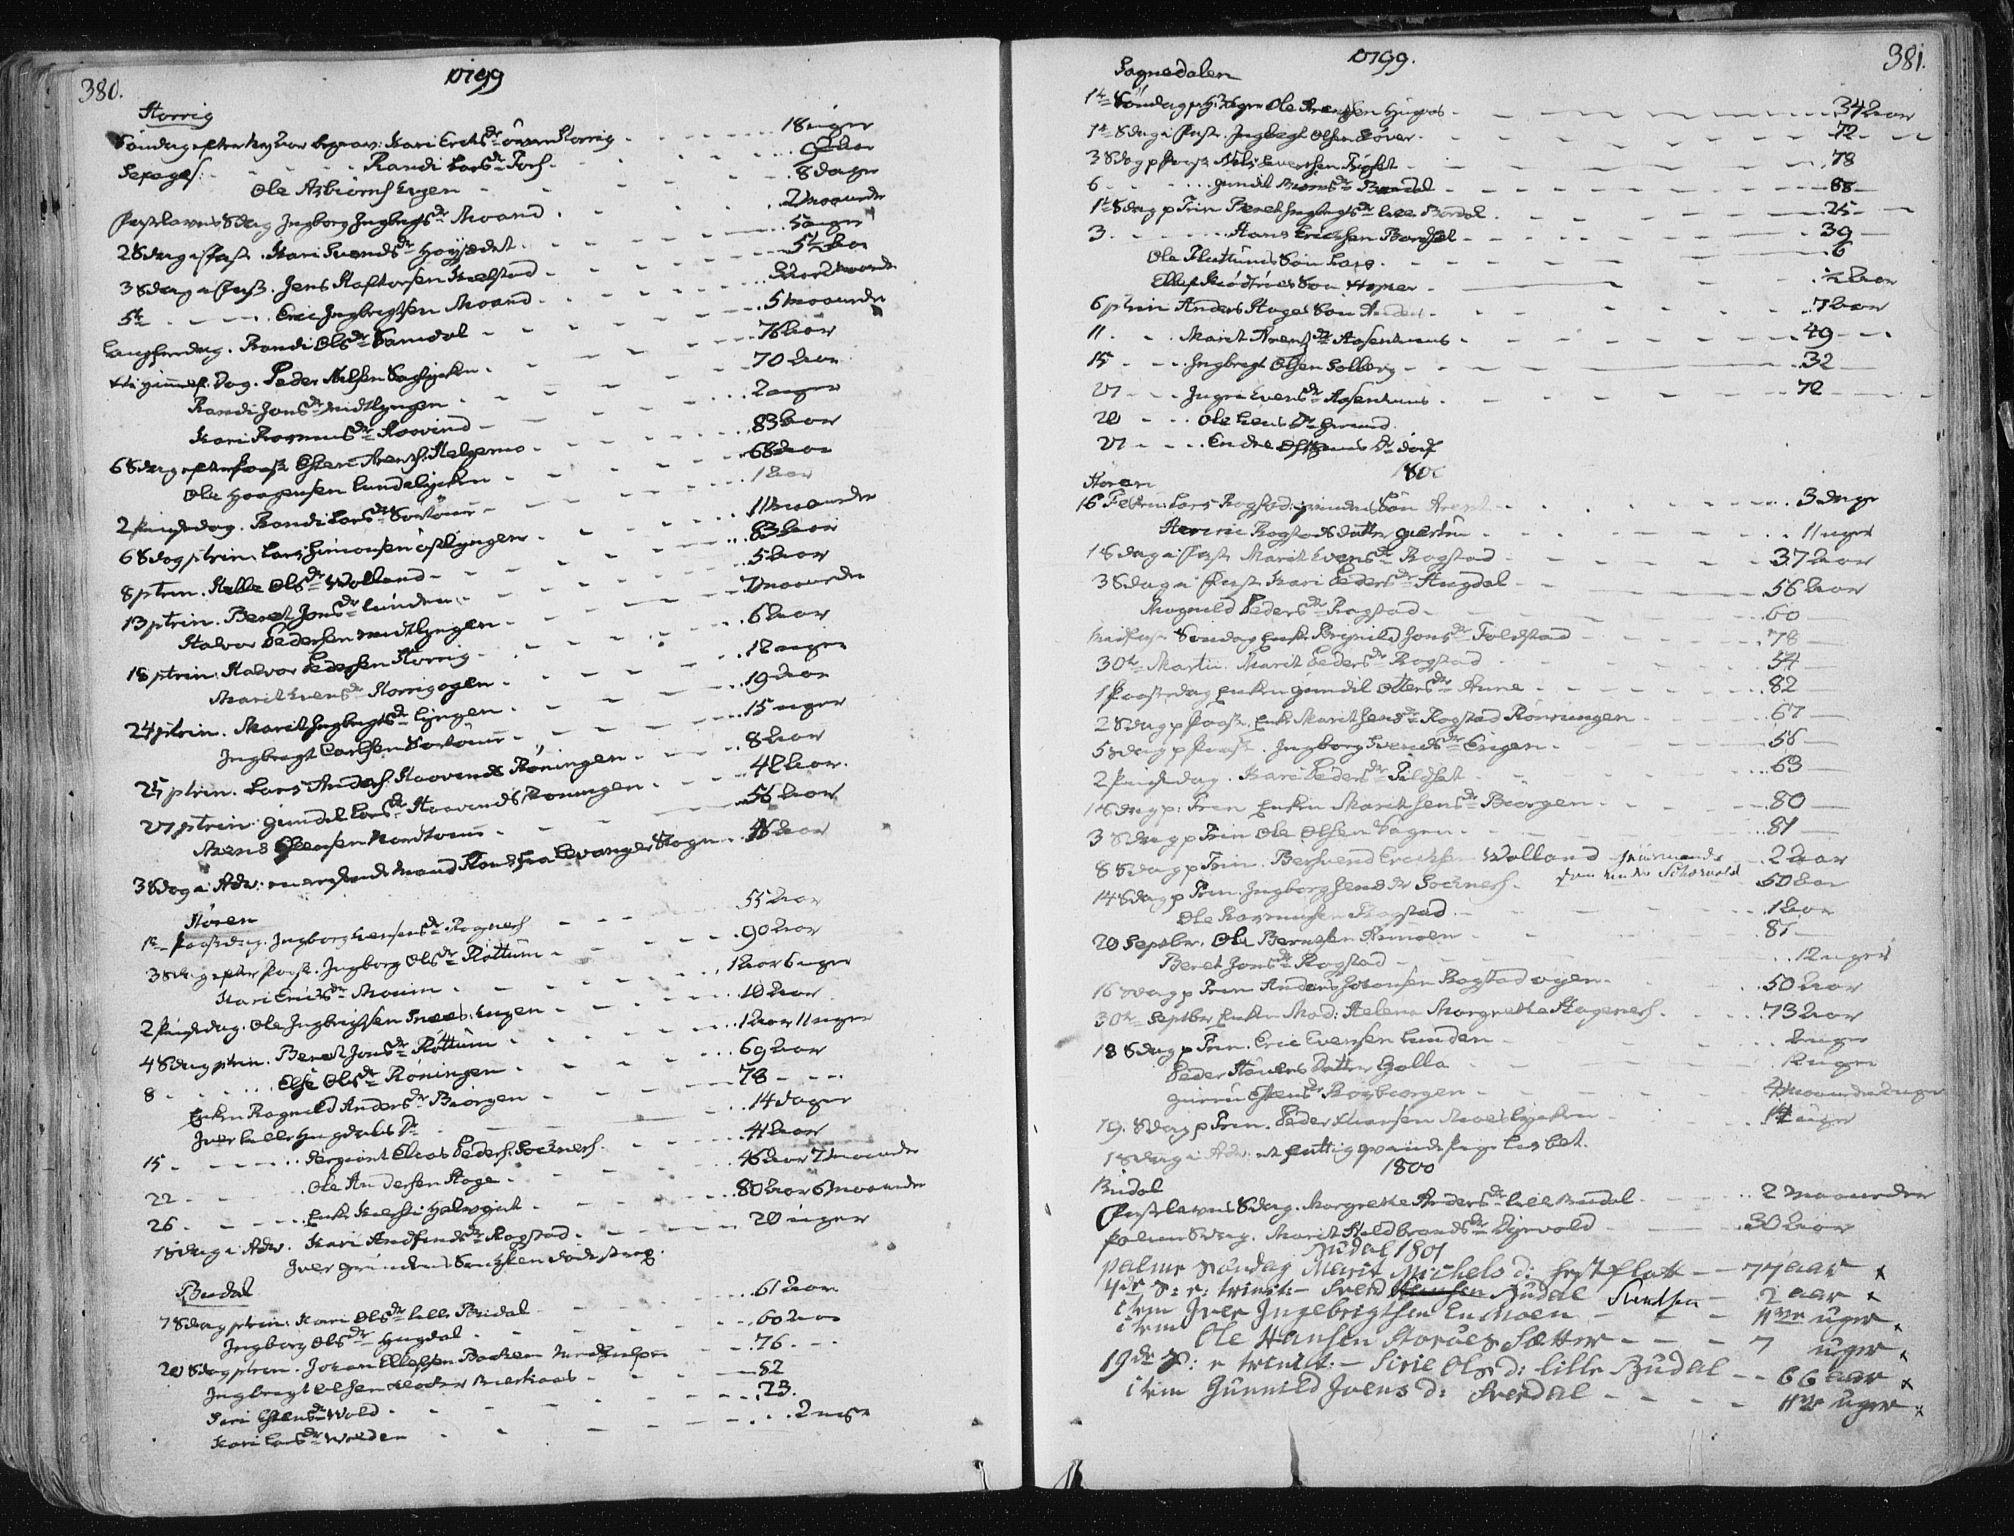 SAT, Ministerialprotokoller, klokkerbøker og fødselsregistre - Sør-Trøndelag, 687/L0992: Parish register (official) no. 687A03 /1, 1788-1815, p. 380-381